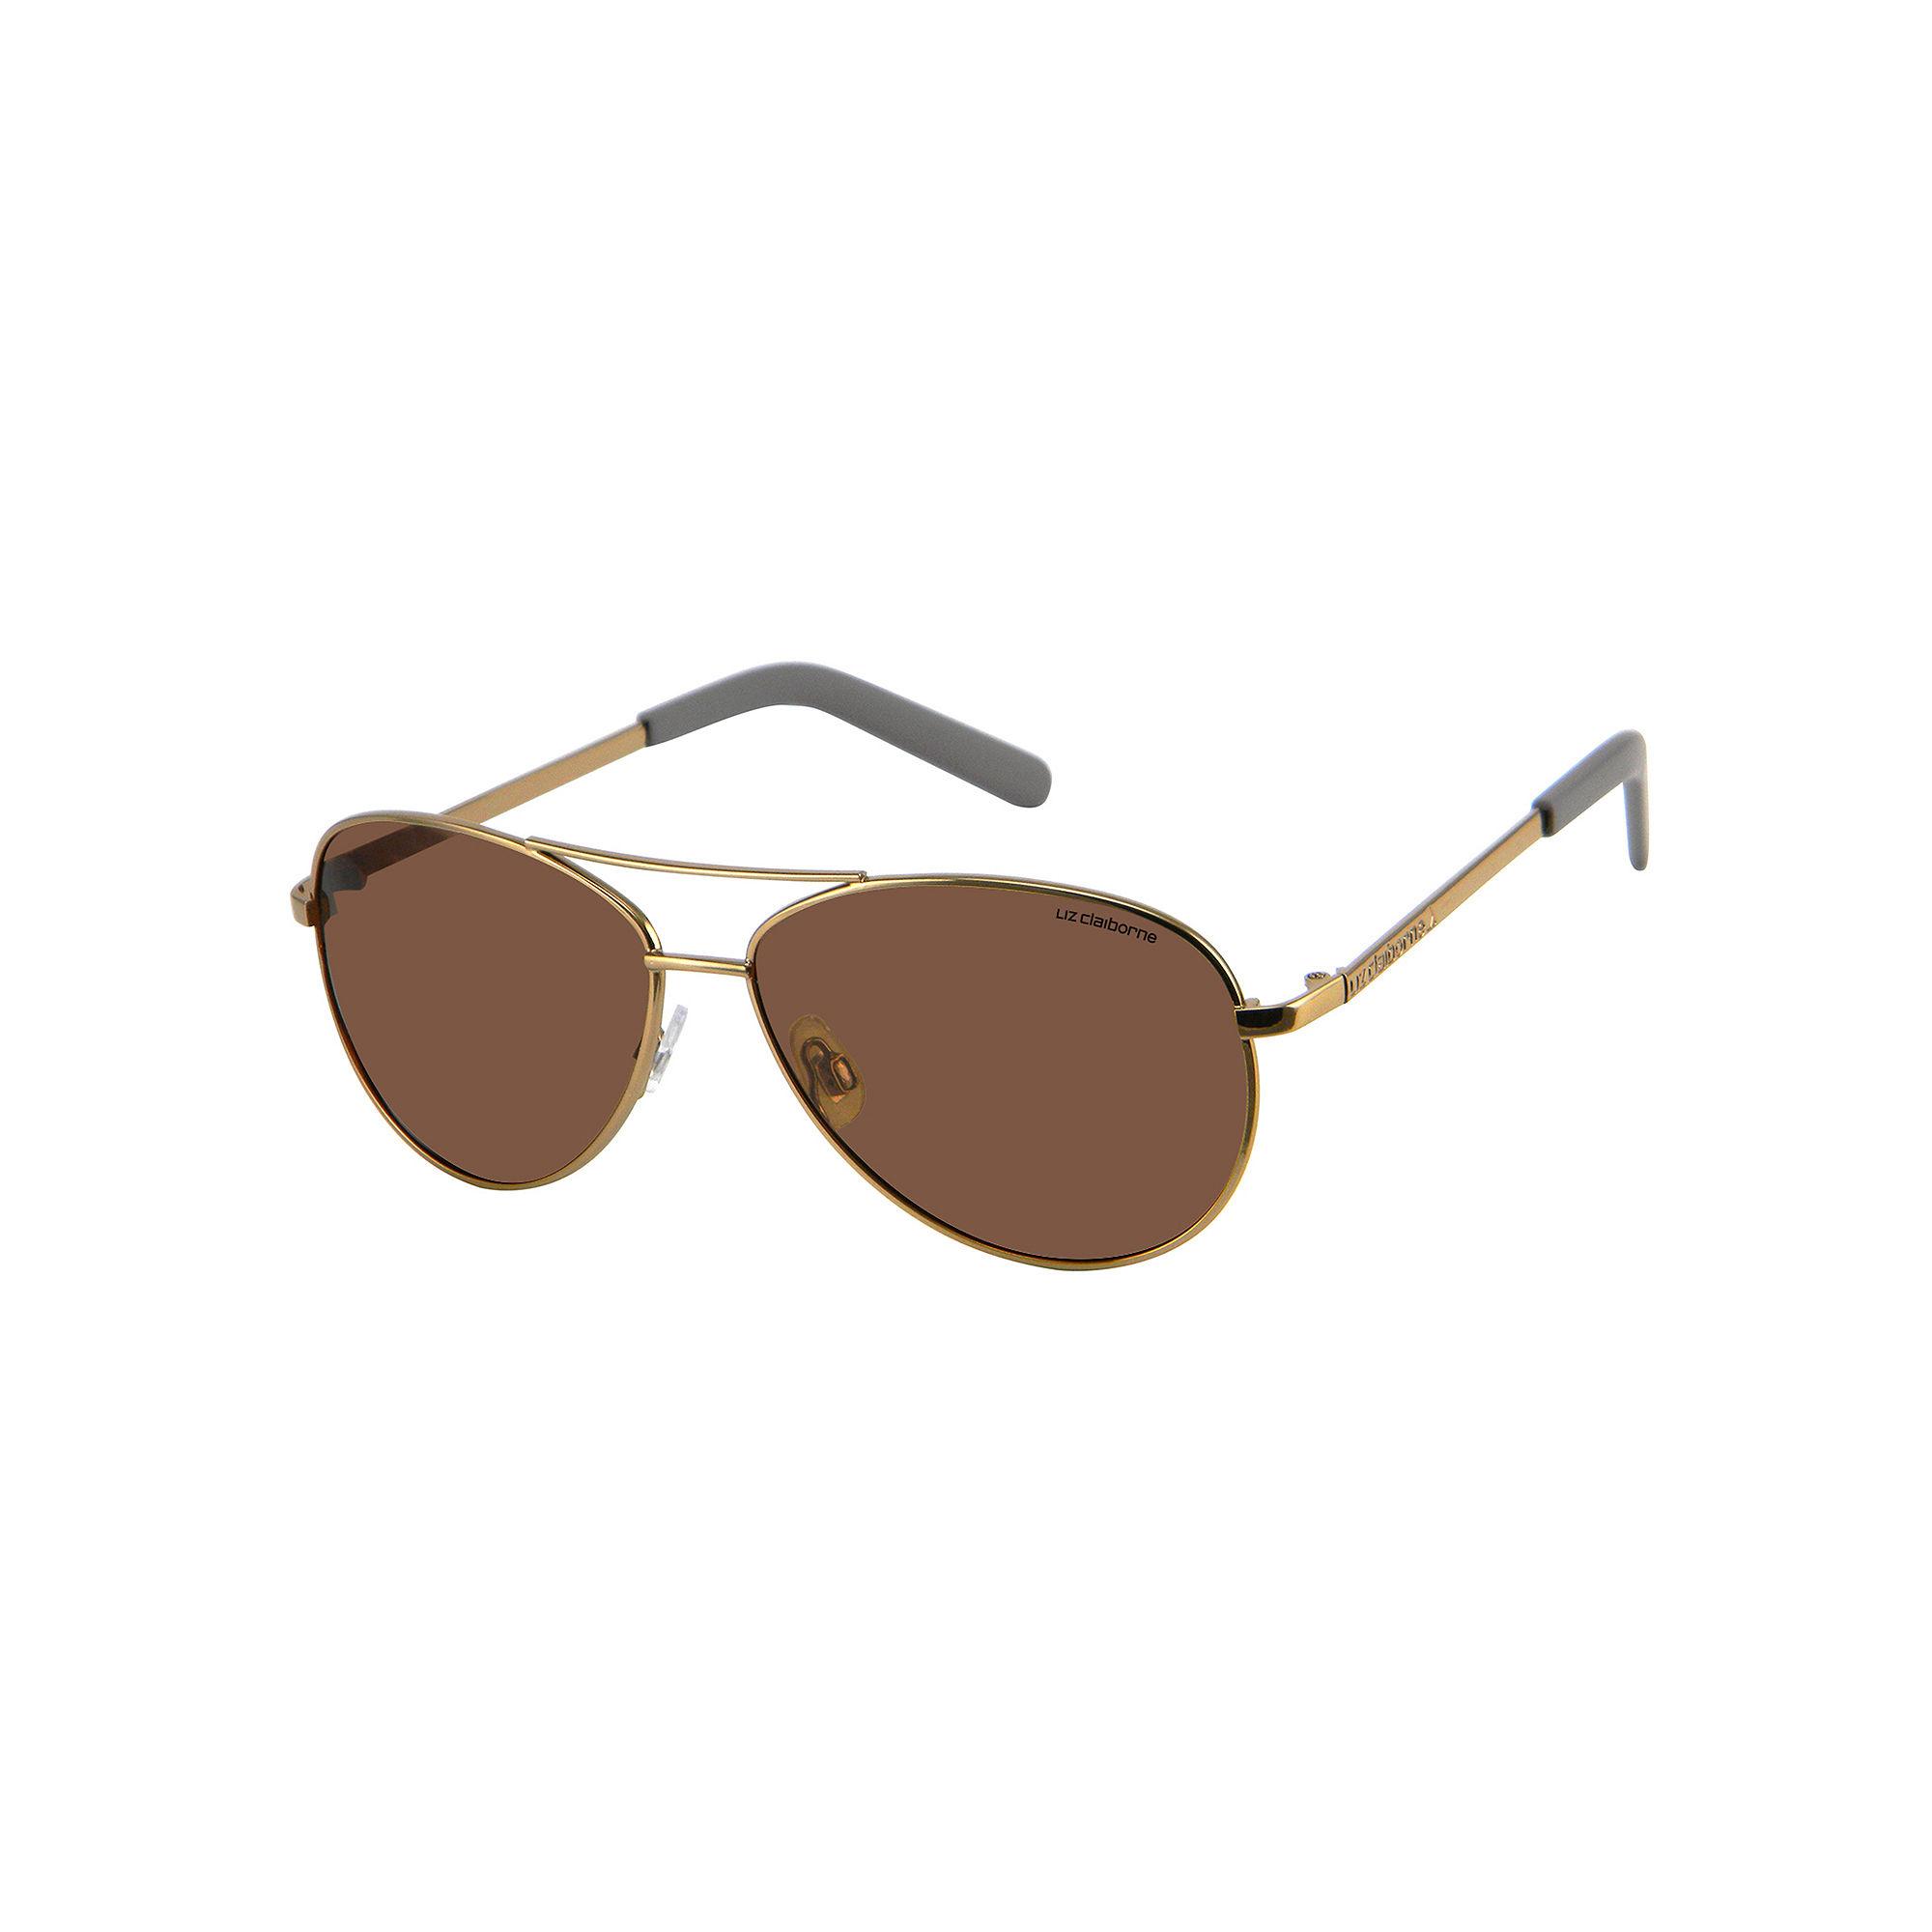 Liz Claiborne Garnet Polarized Aviator Sunglasses